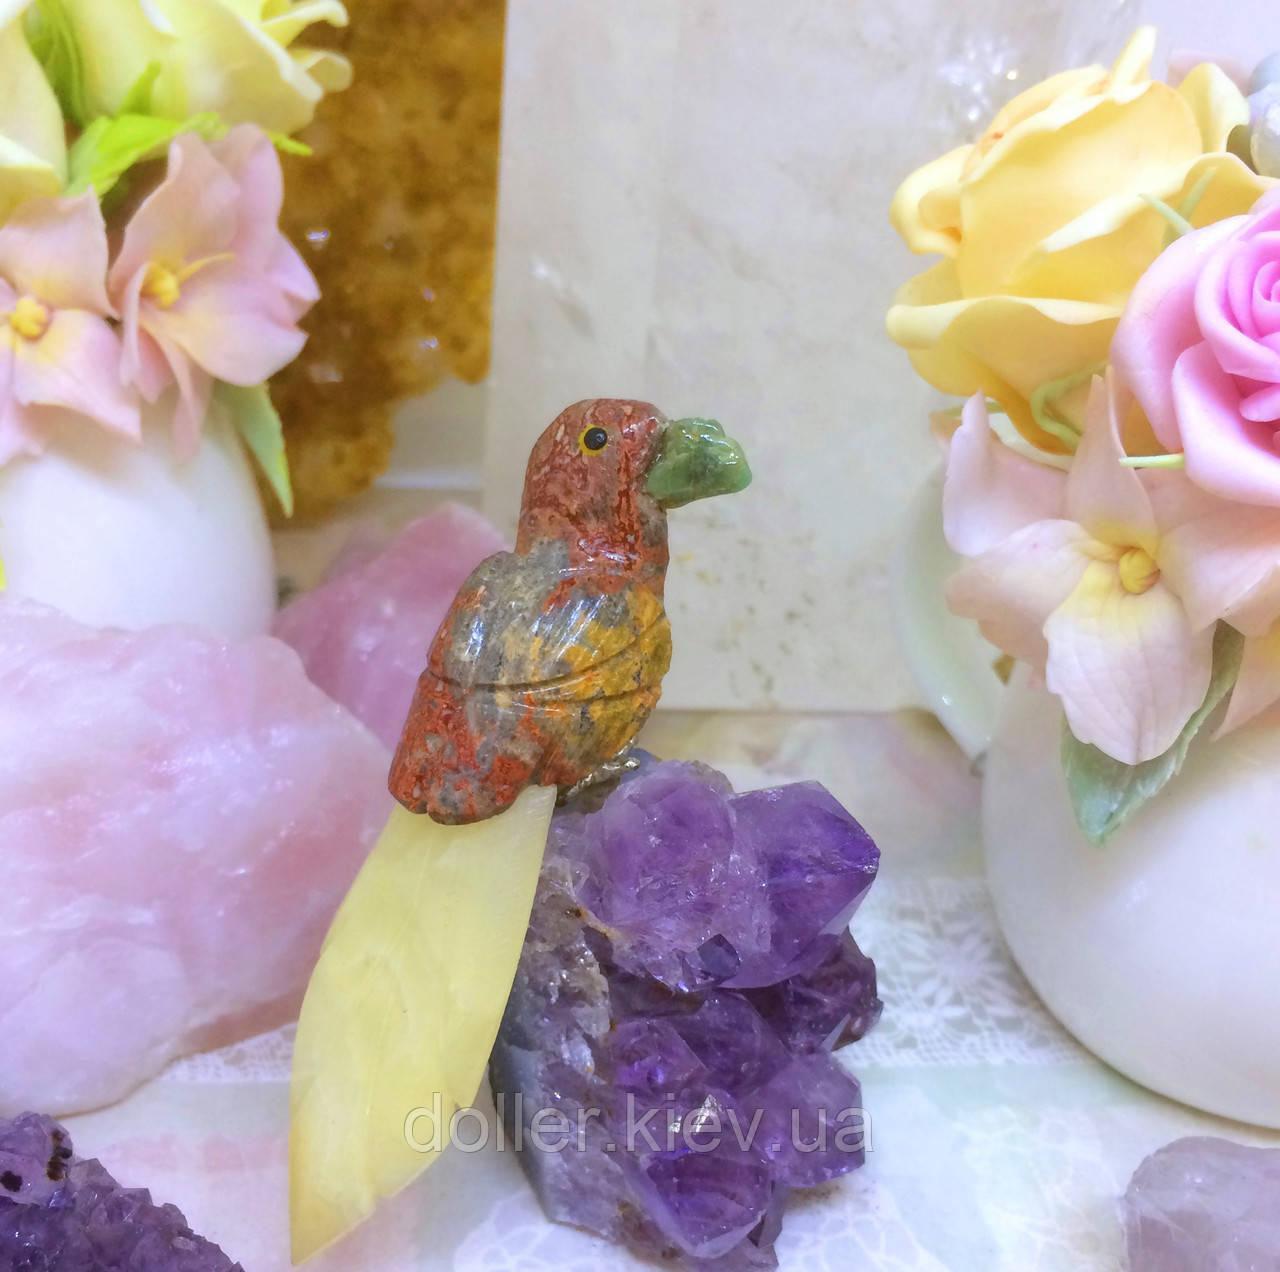 Пташка з каменю 12 див. авантюрин, яшма, медовий кальцит